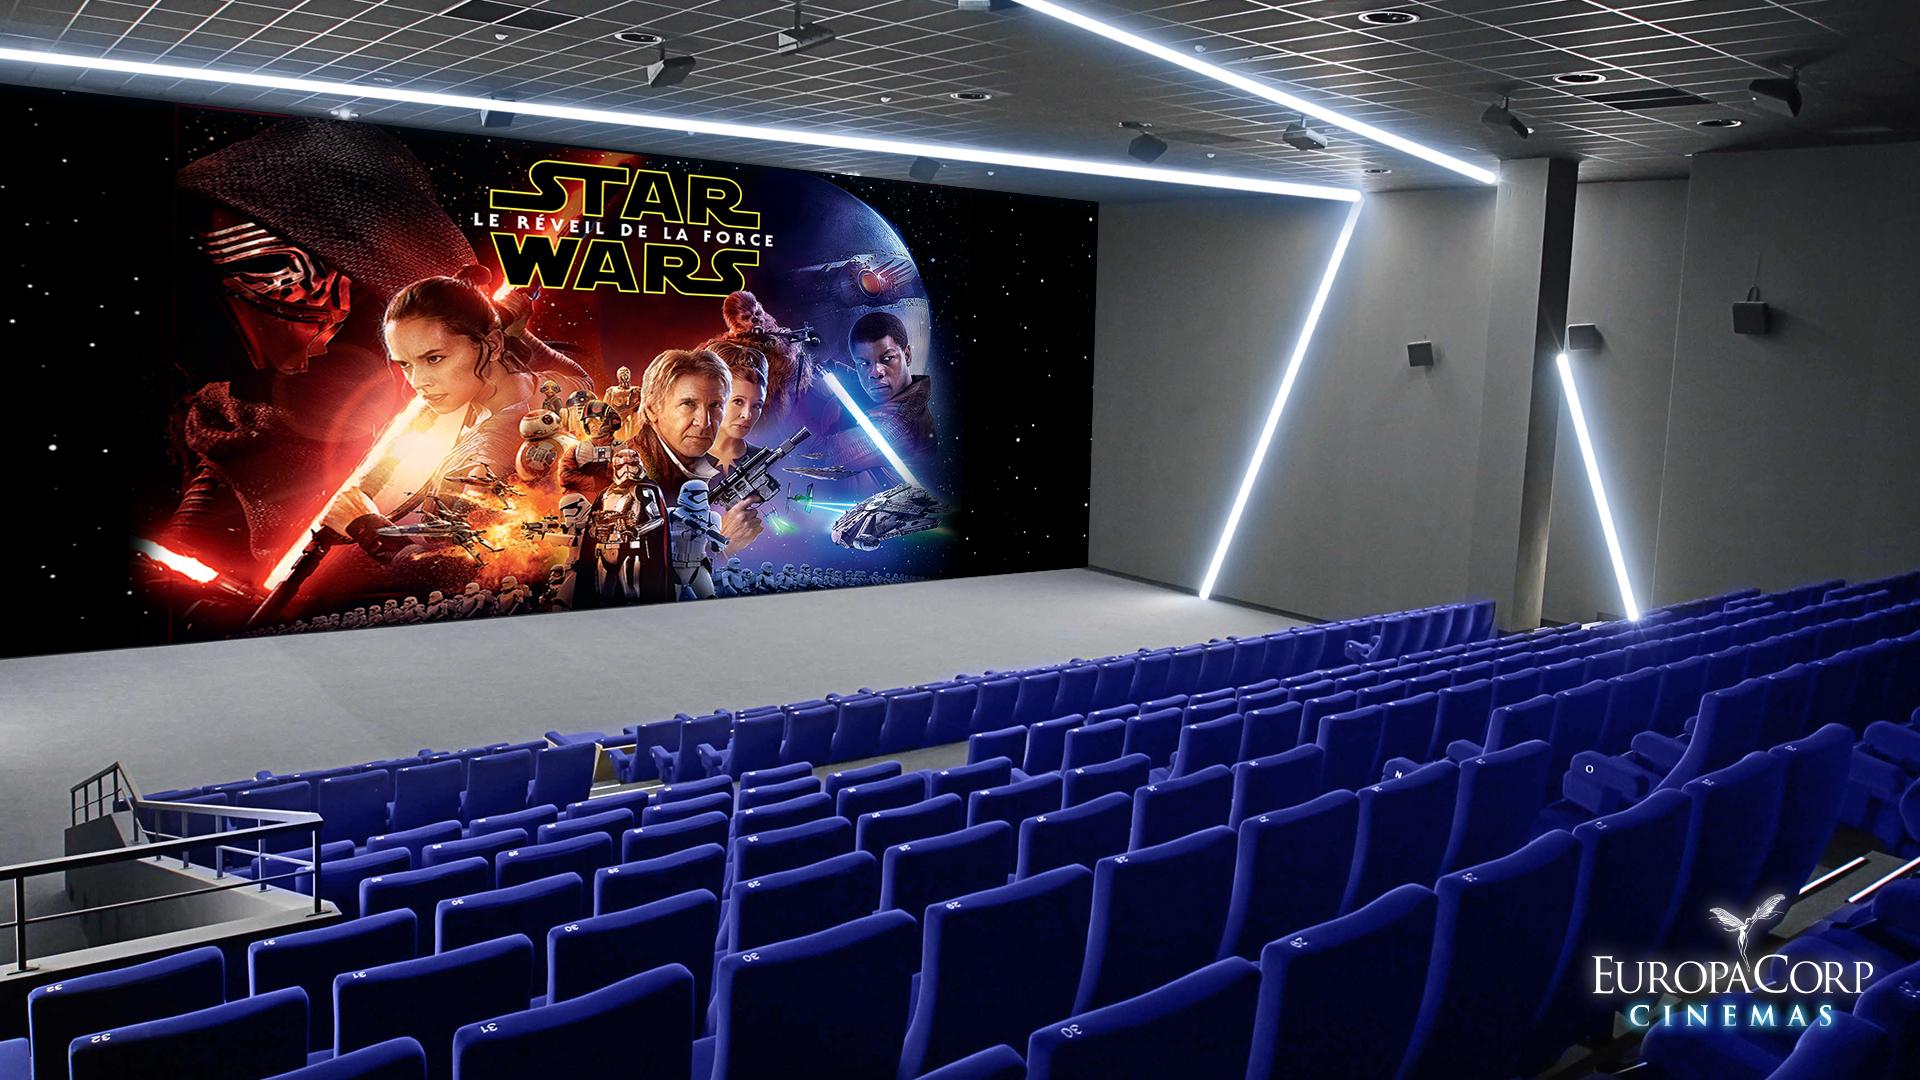 Star Wars EuropaCorp